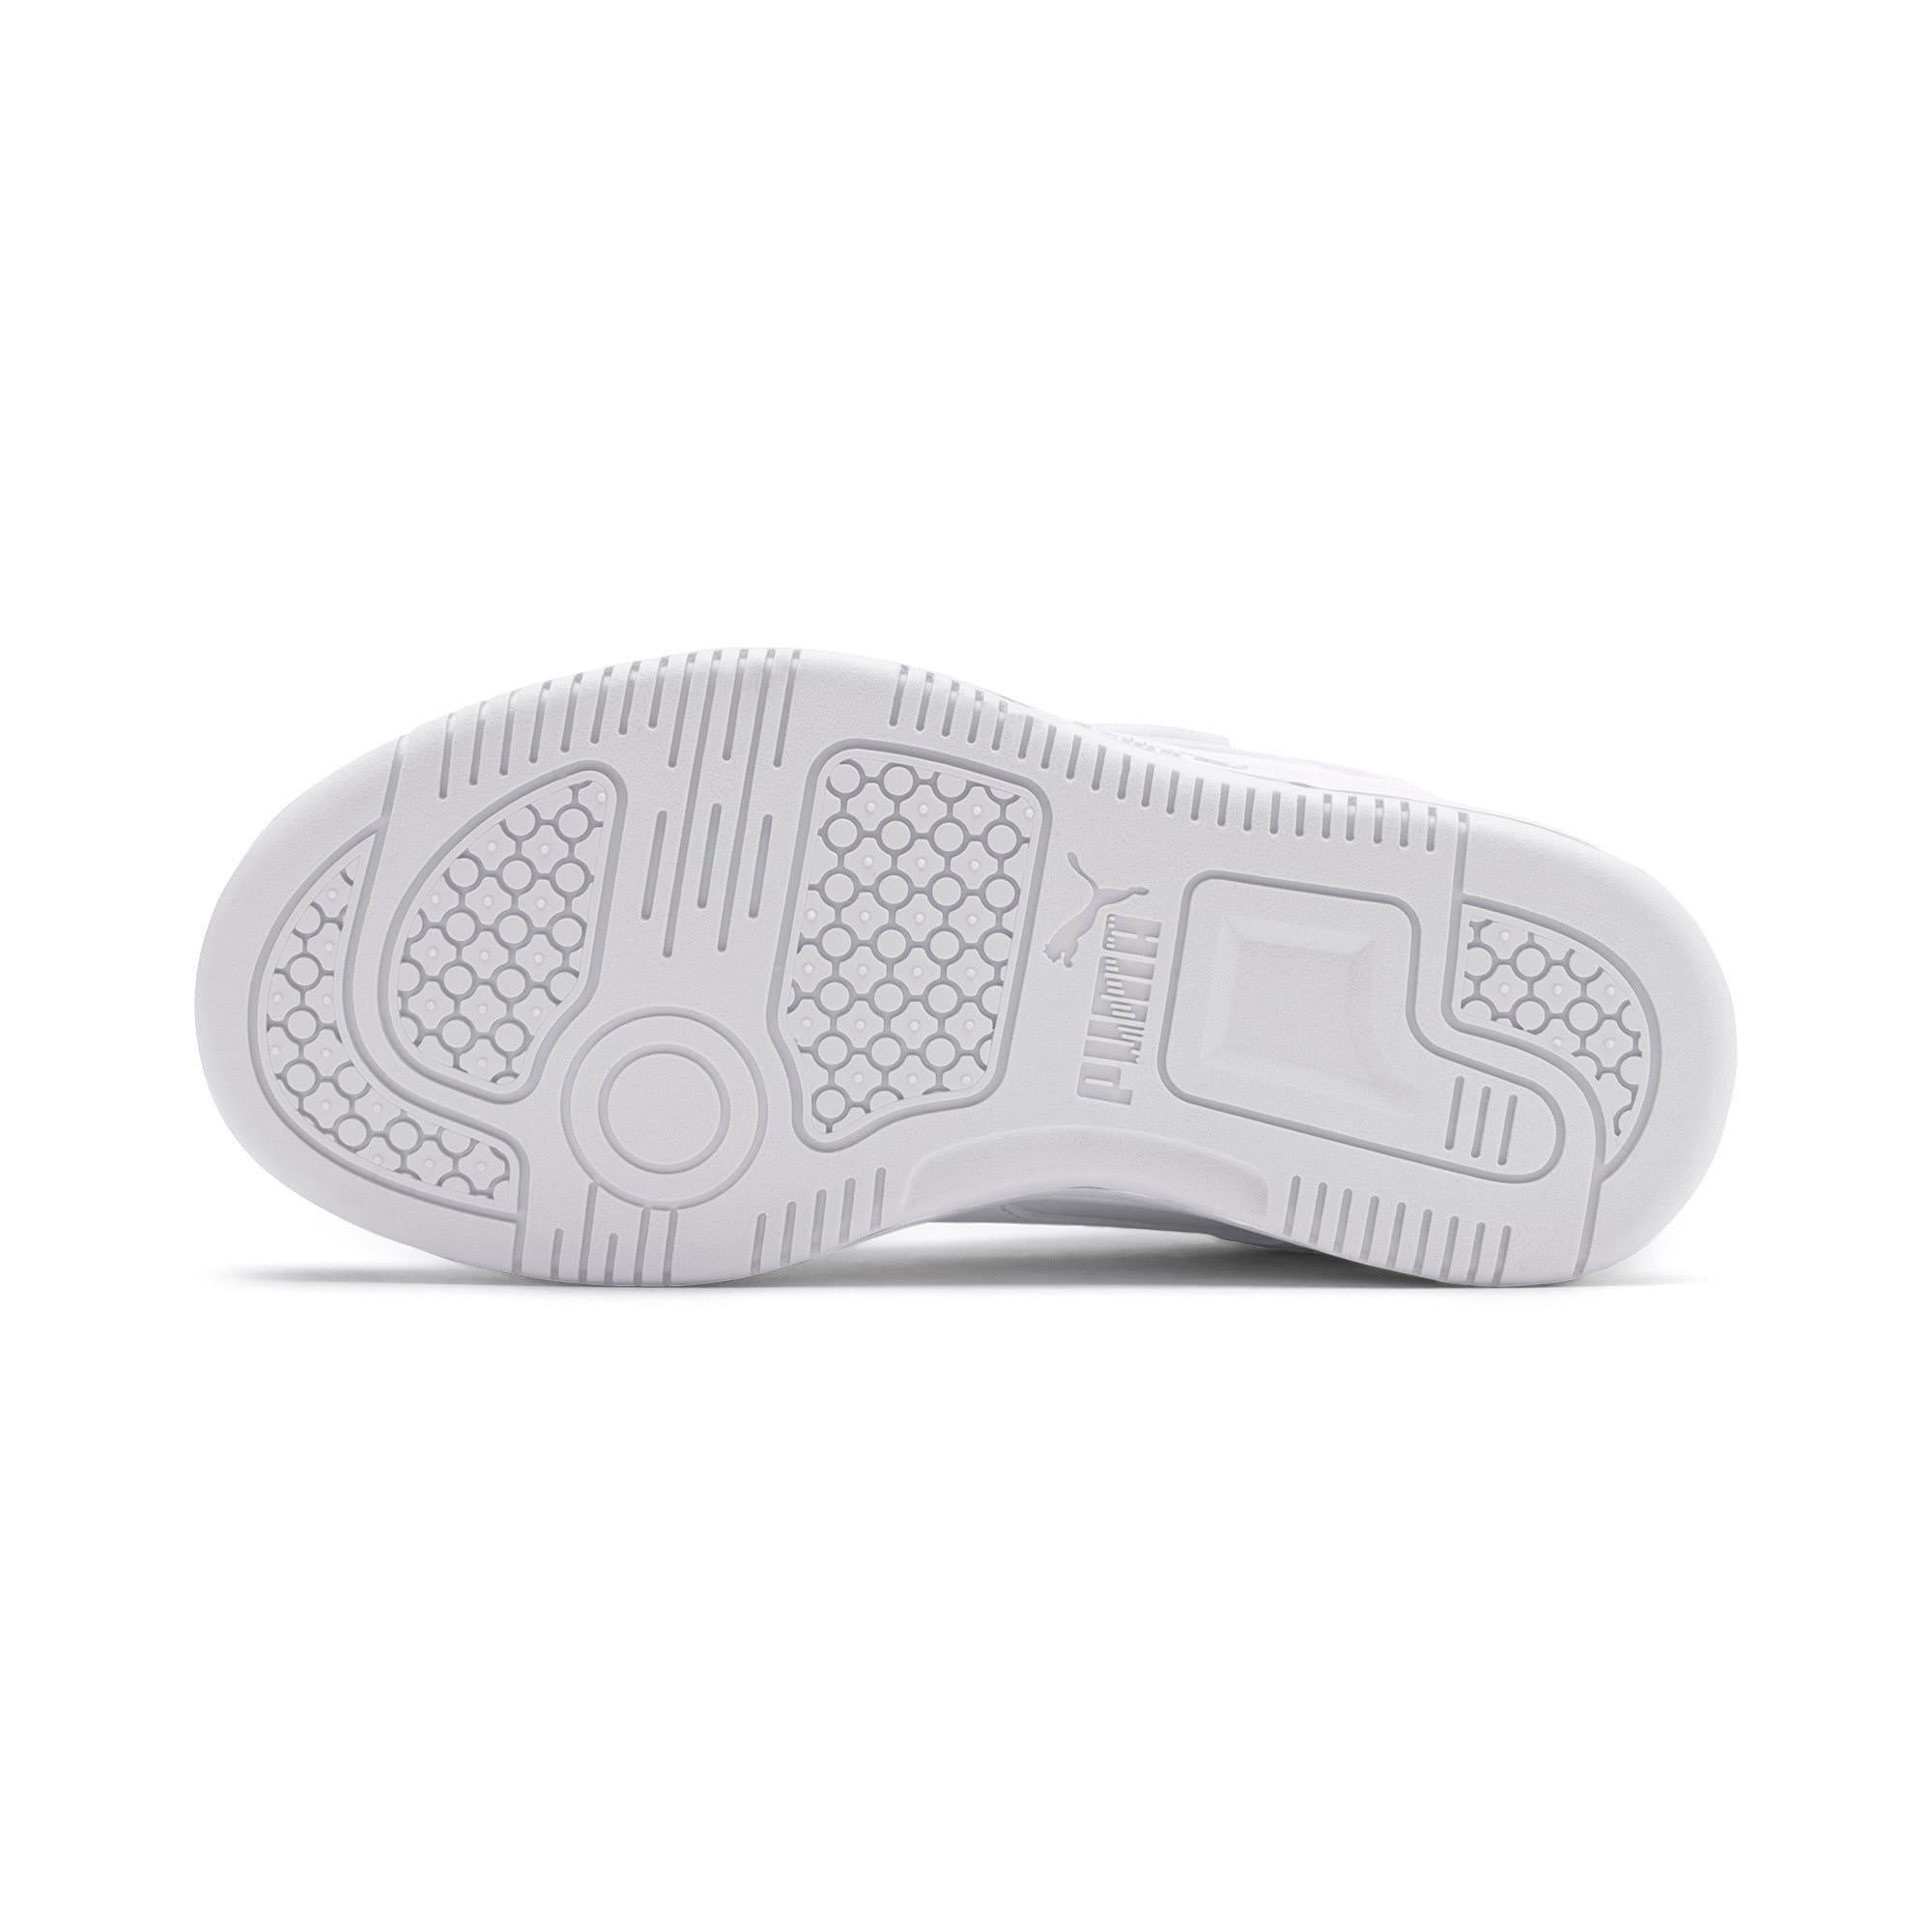 Thumbnail 4 of PUMA Rebound LayUp Lo Little Kids' Shoes, Puma White-High Rise, medium